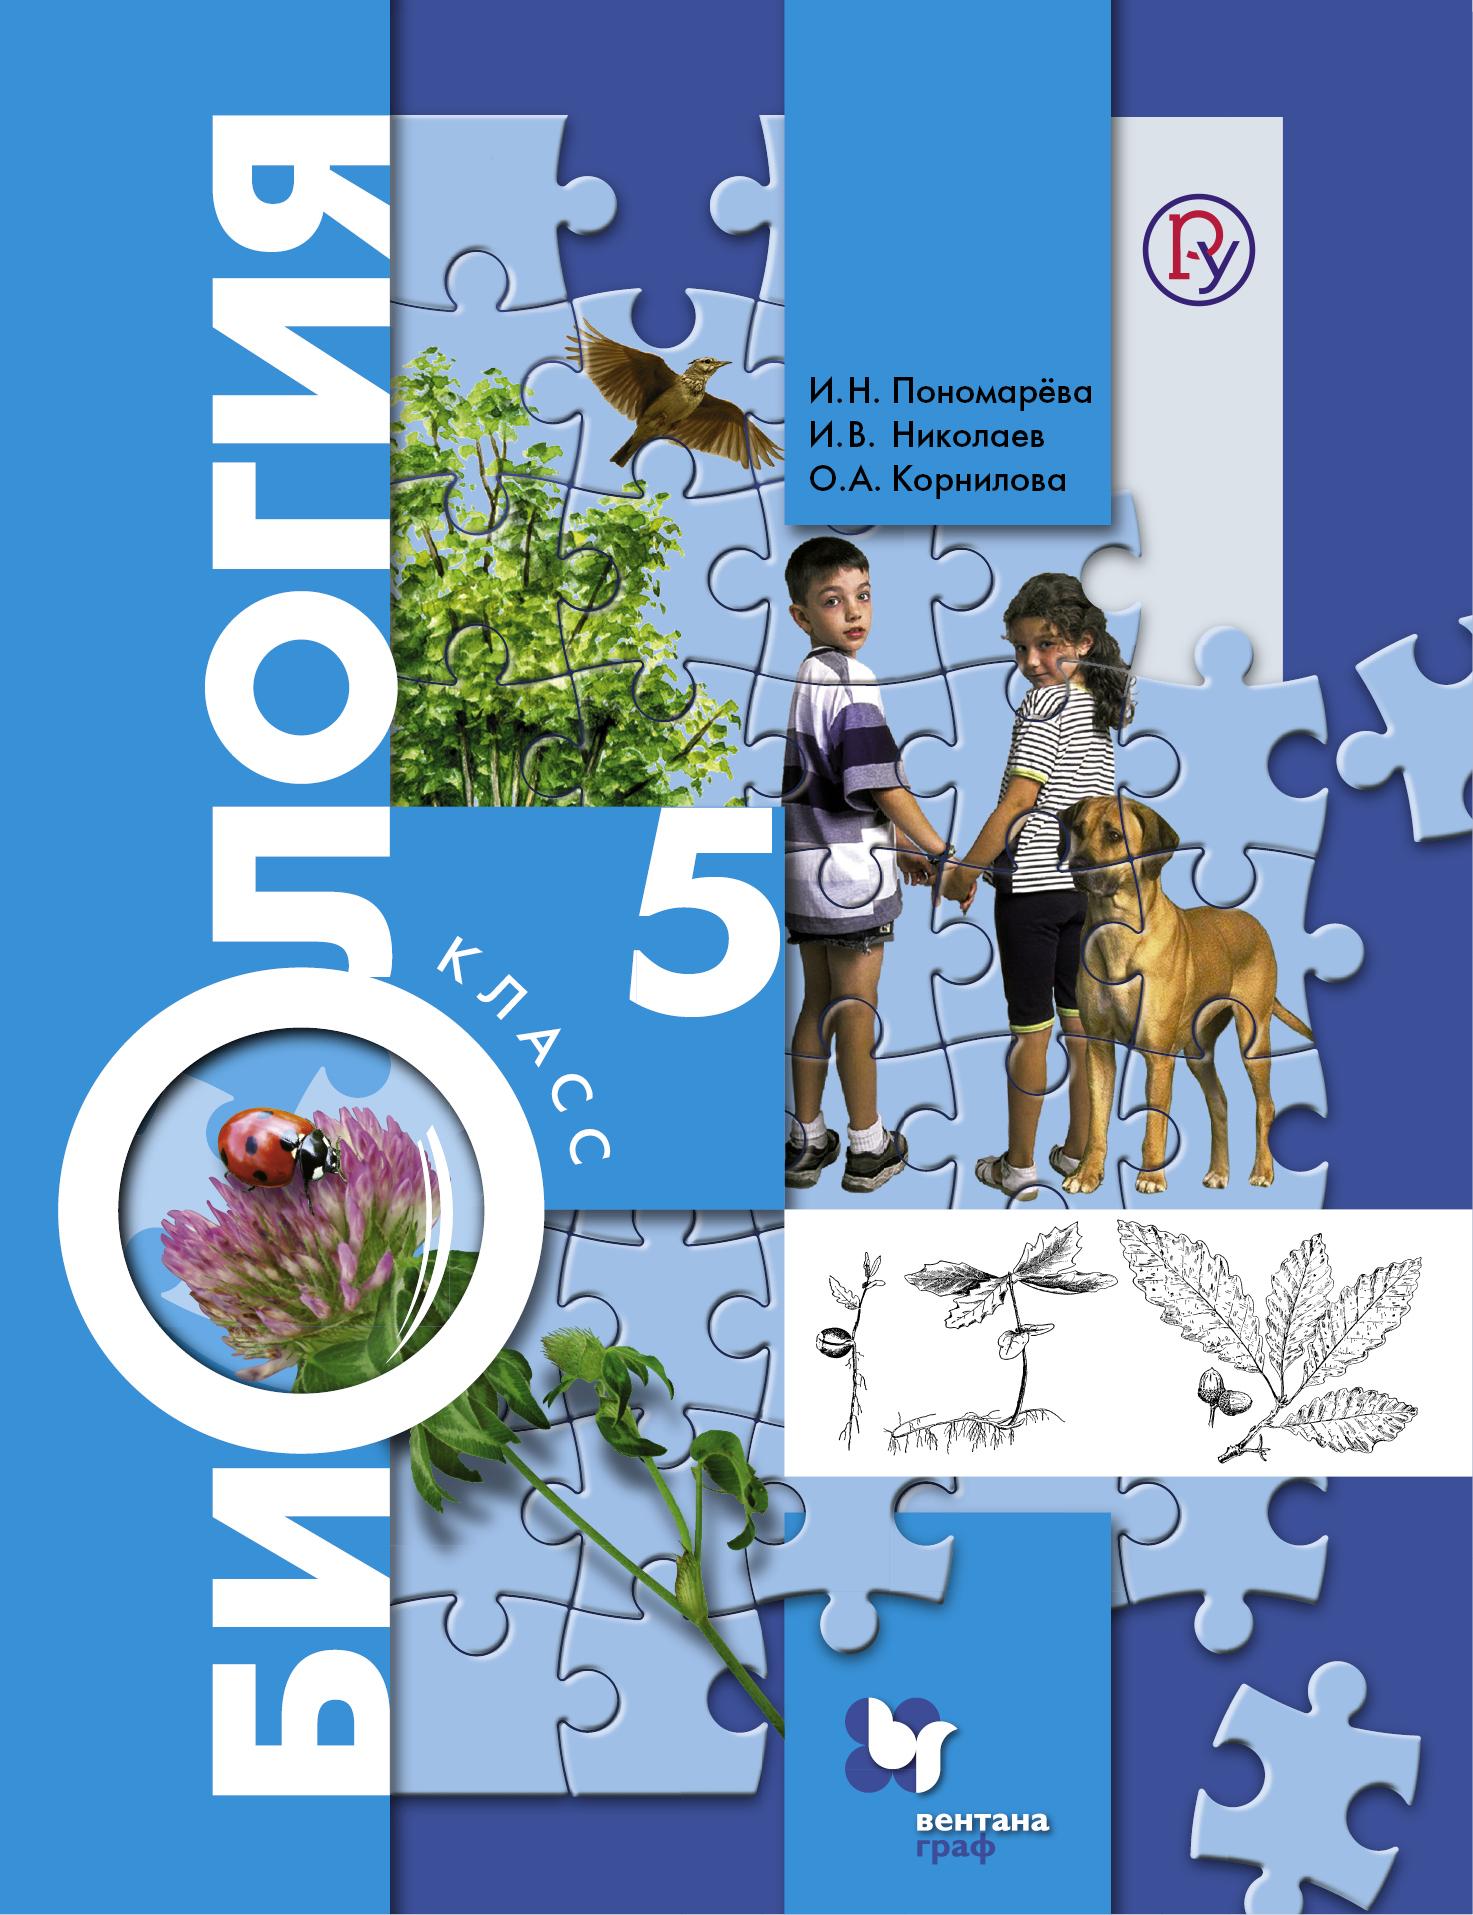 Биология. 5класс. Учебник ( Пономарева И.Н., Корнилова О.А.  )